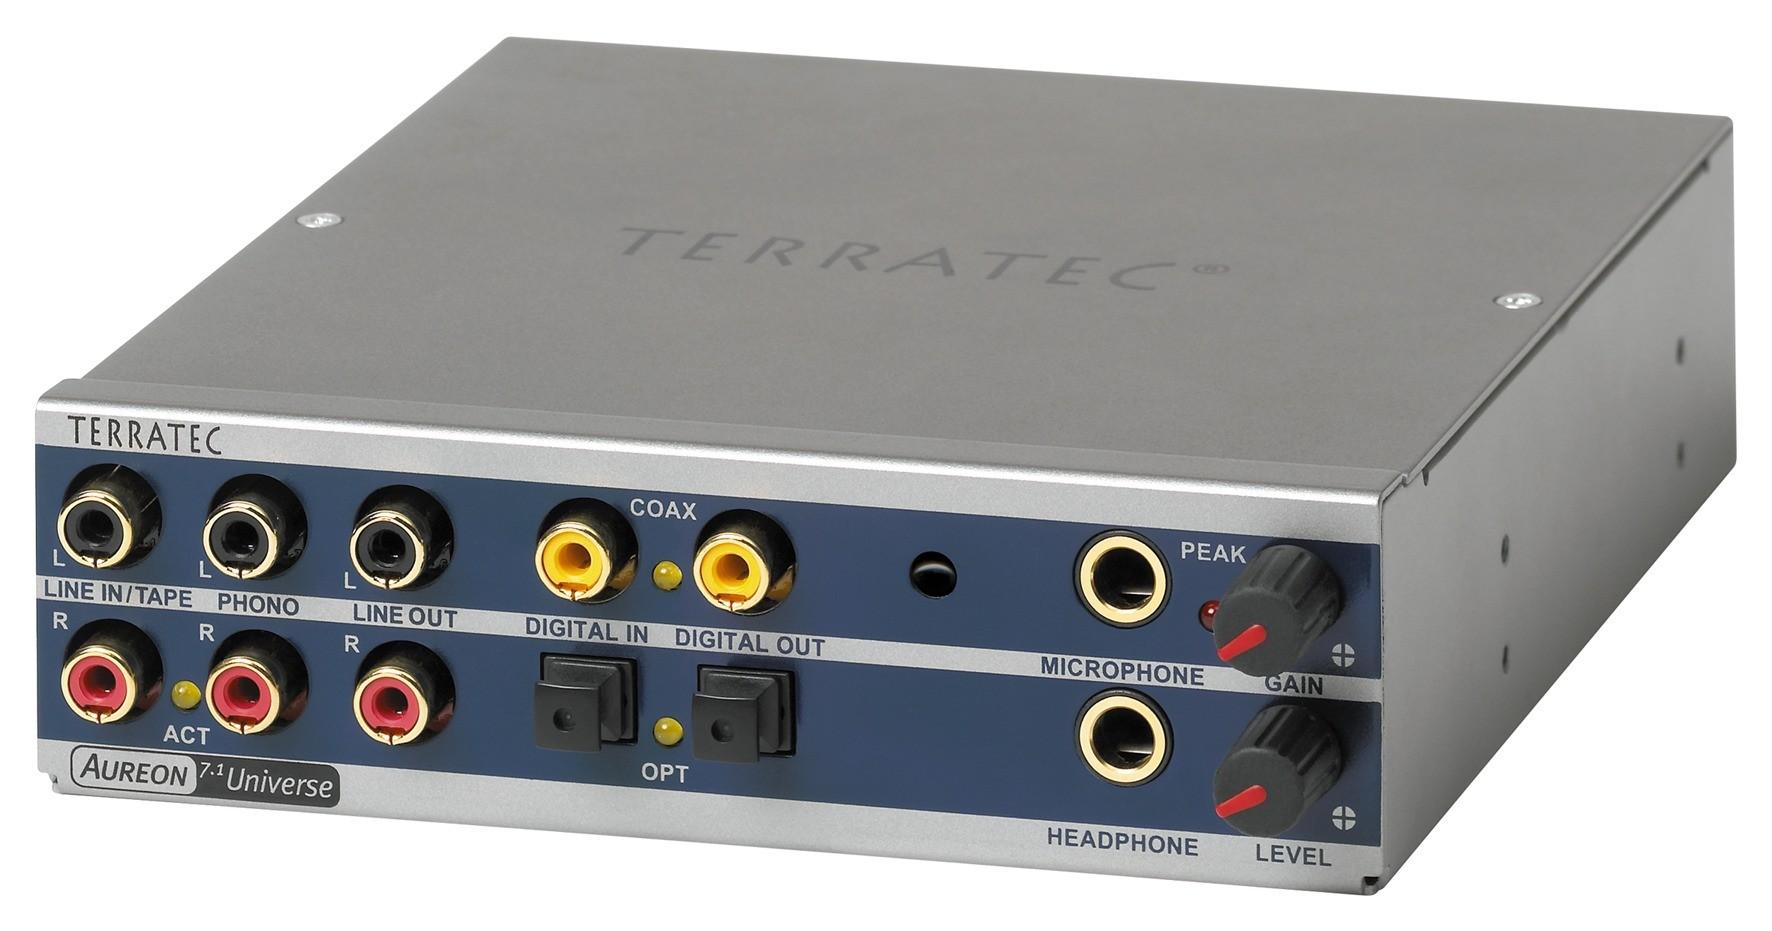 Terratec Aureon 7.1 Universe 64 BIT